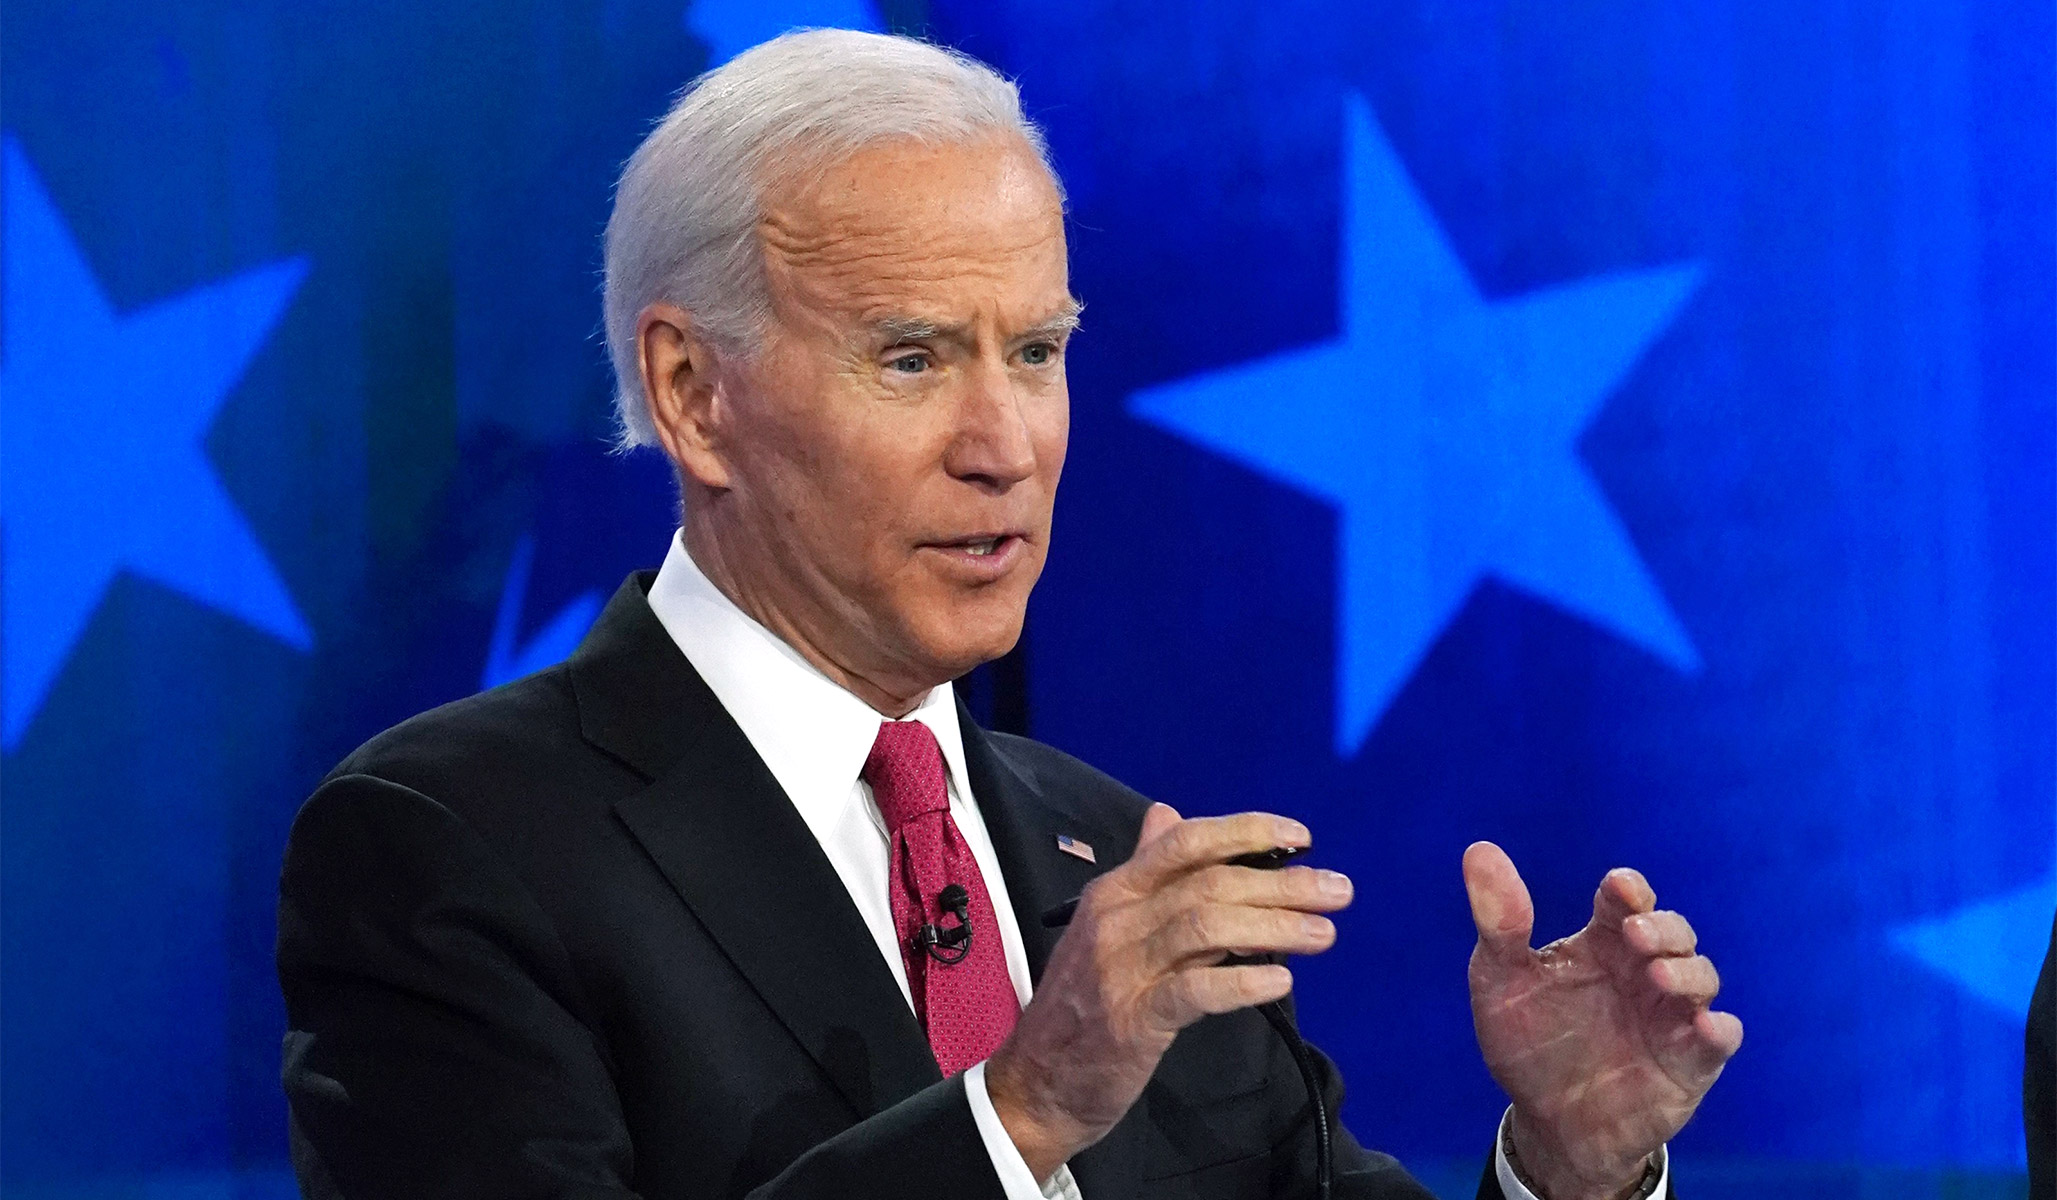 Joe Biden Refuses to Testify in Impeachment Hearings